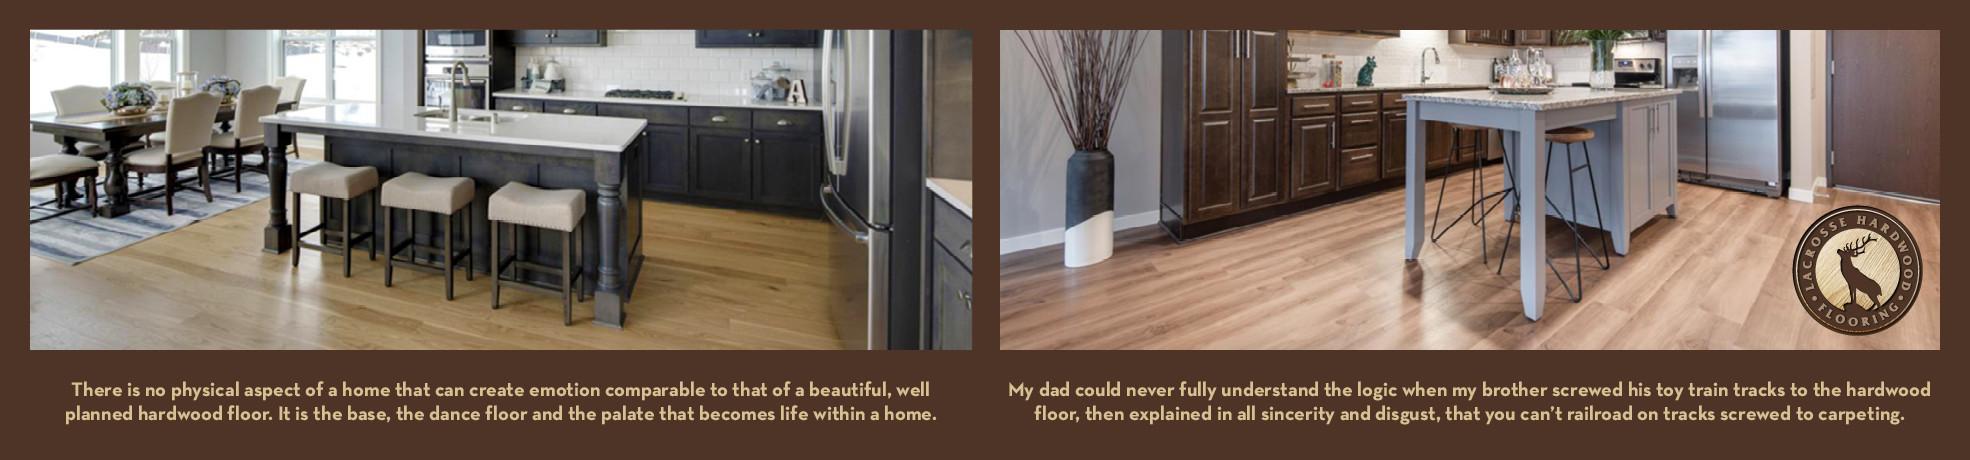 oak hardwood flooring price of lacrosse hardwood flooring walnut white oak red oak hickory regarding lhfsliderv24